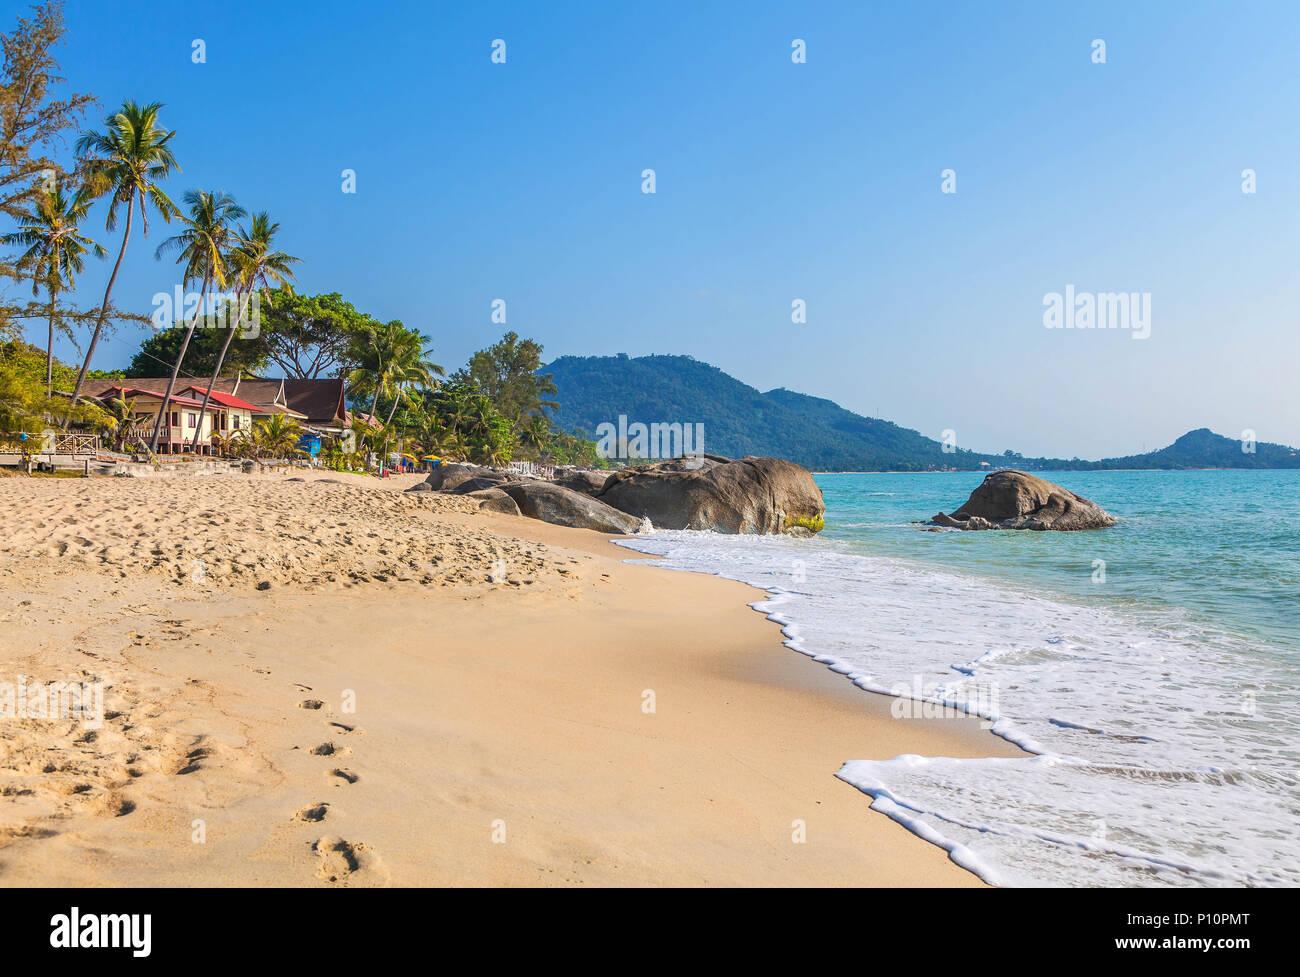 Sunrise over Samui island in Thailand. Lamai Beach. - Stock Image